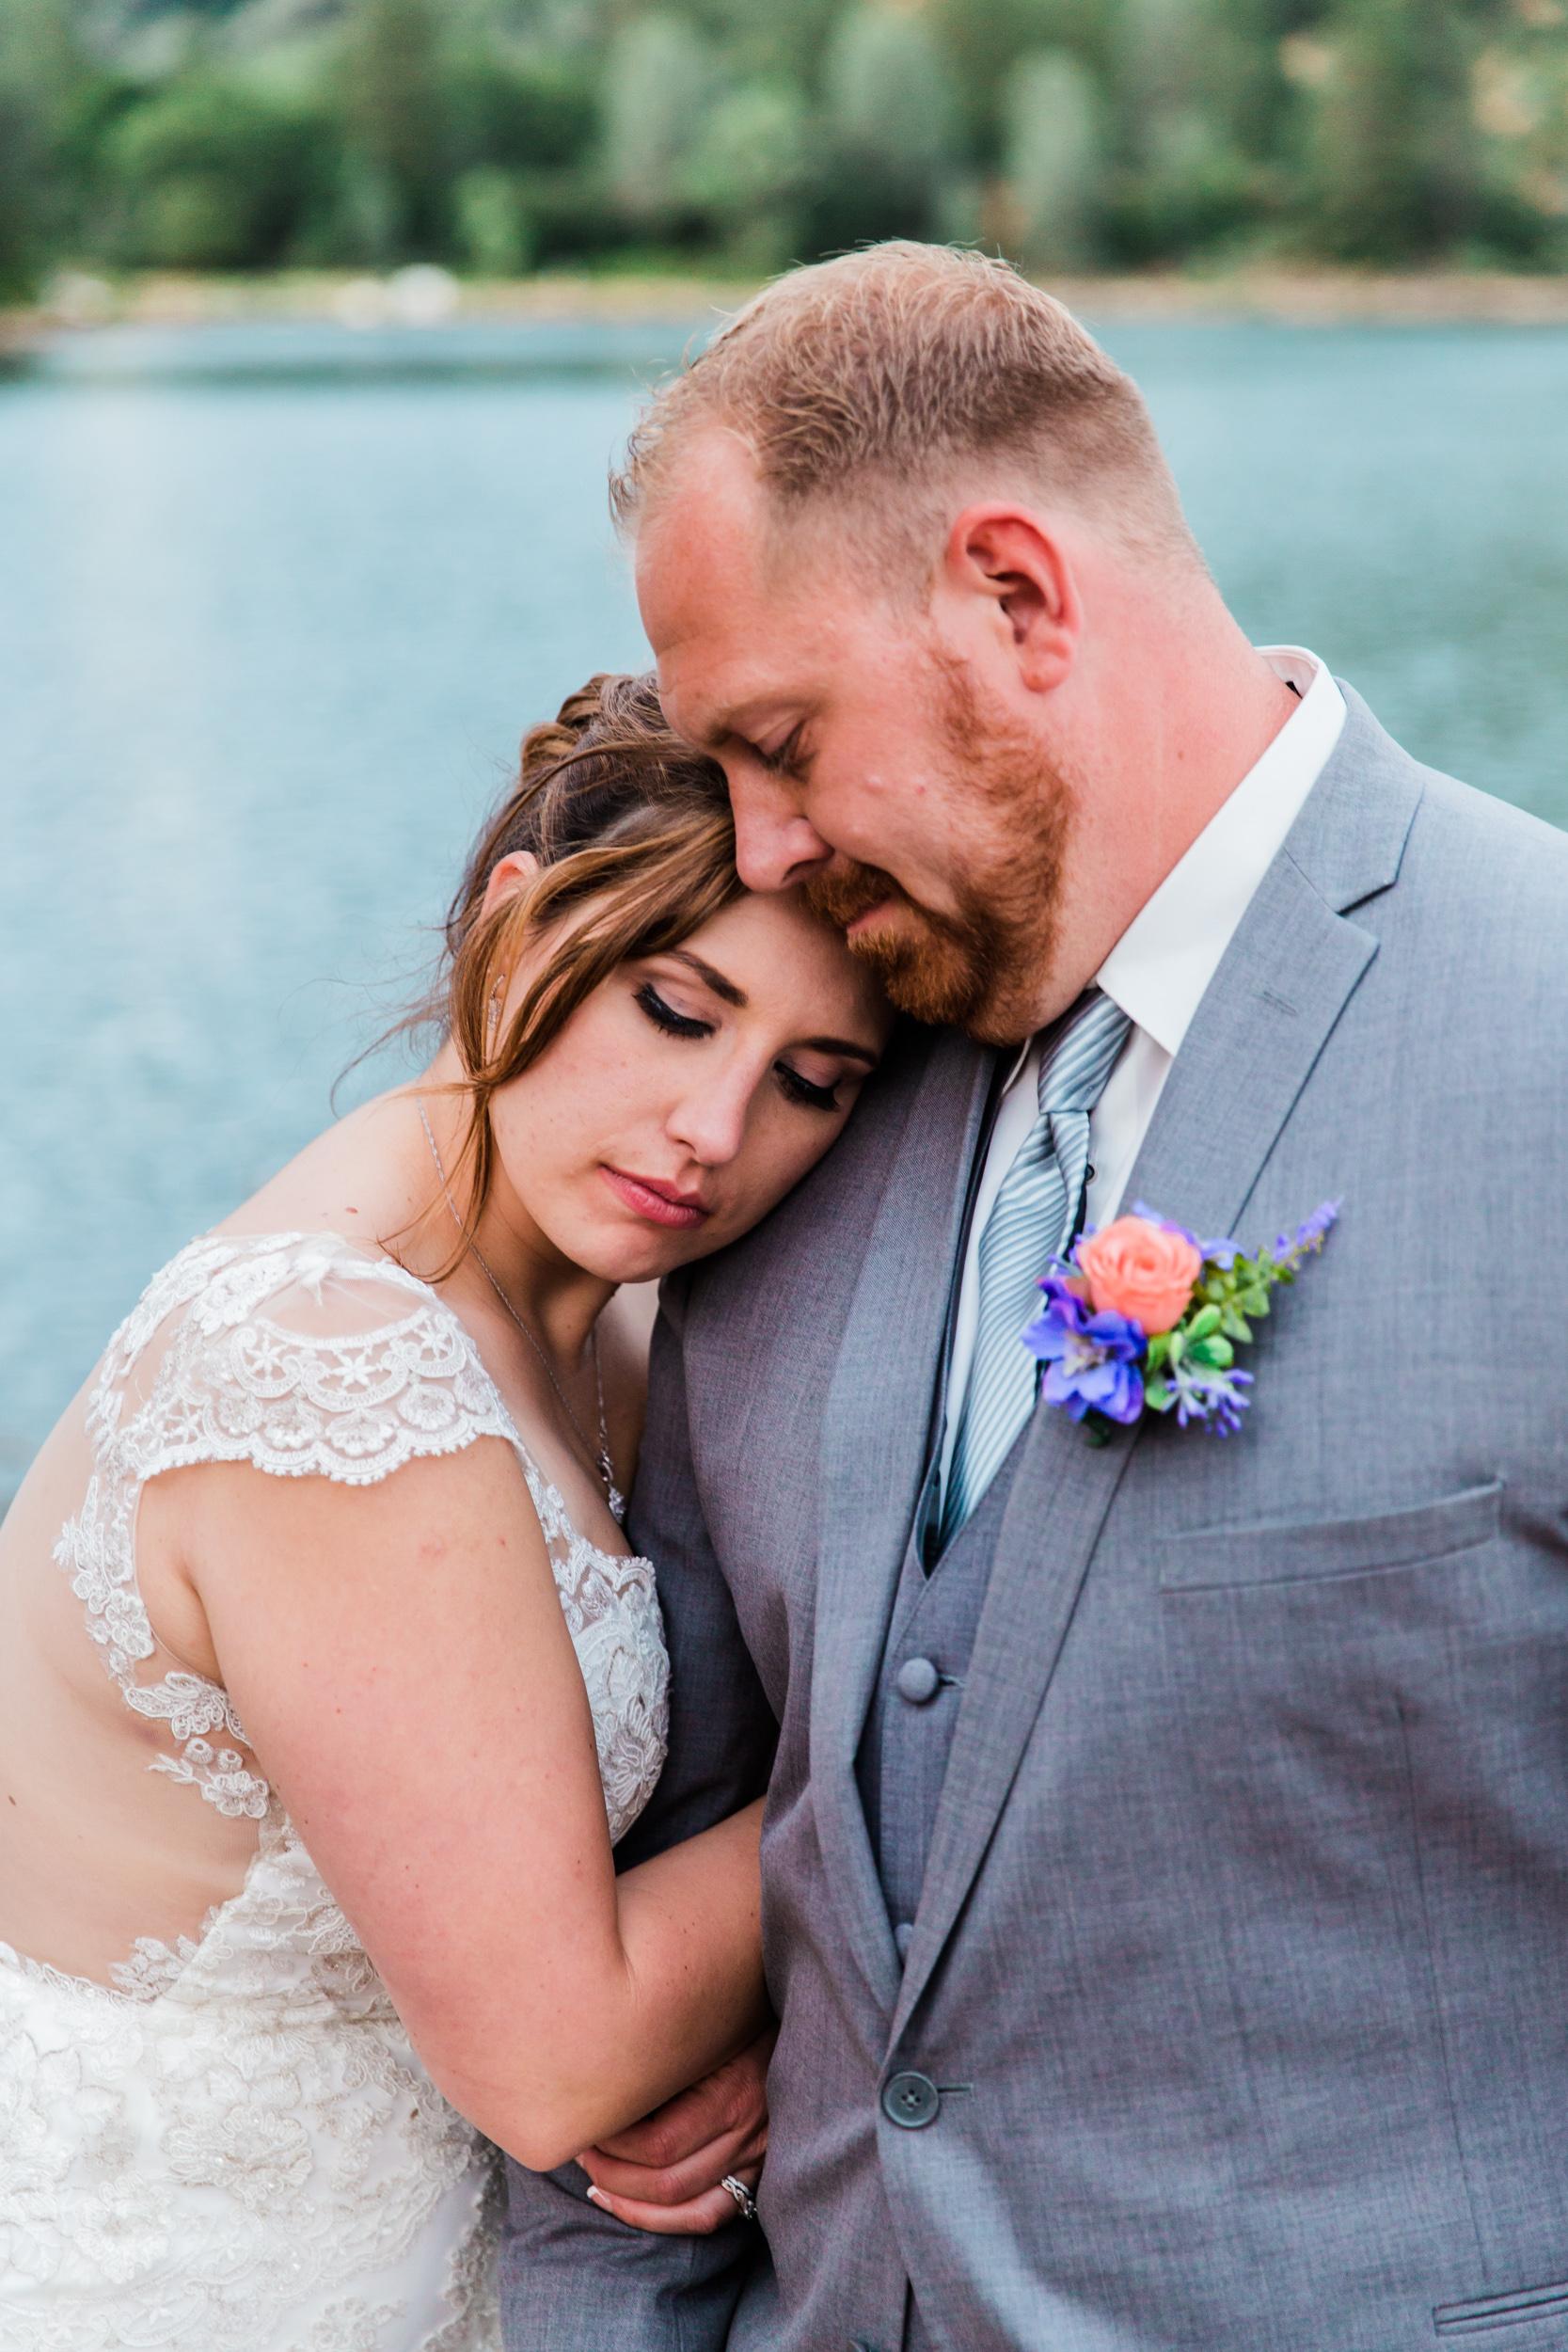 60-3490-jewel-maree-photography-wedding.jpg